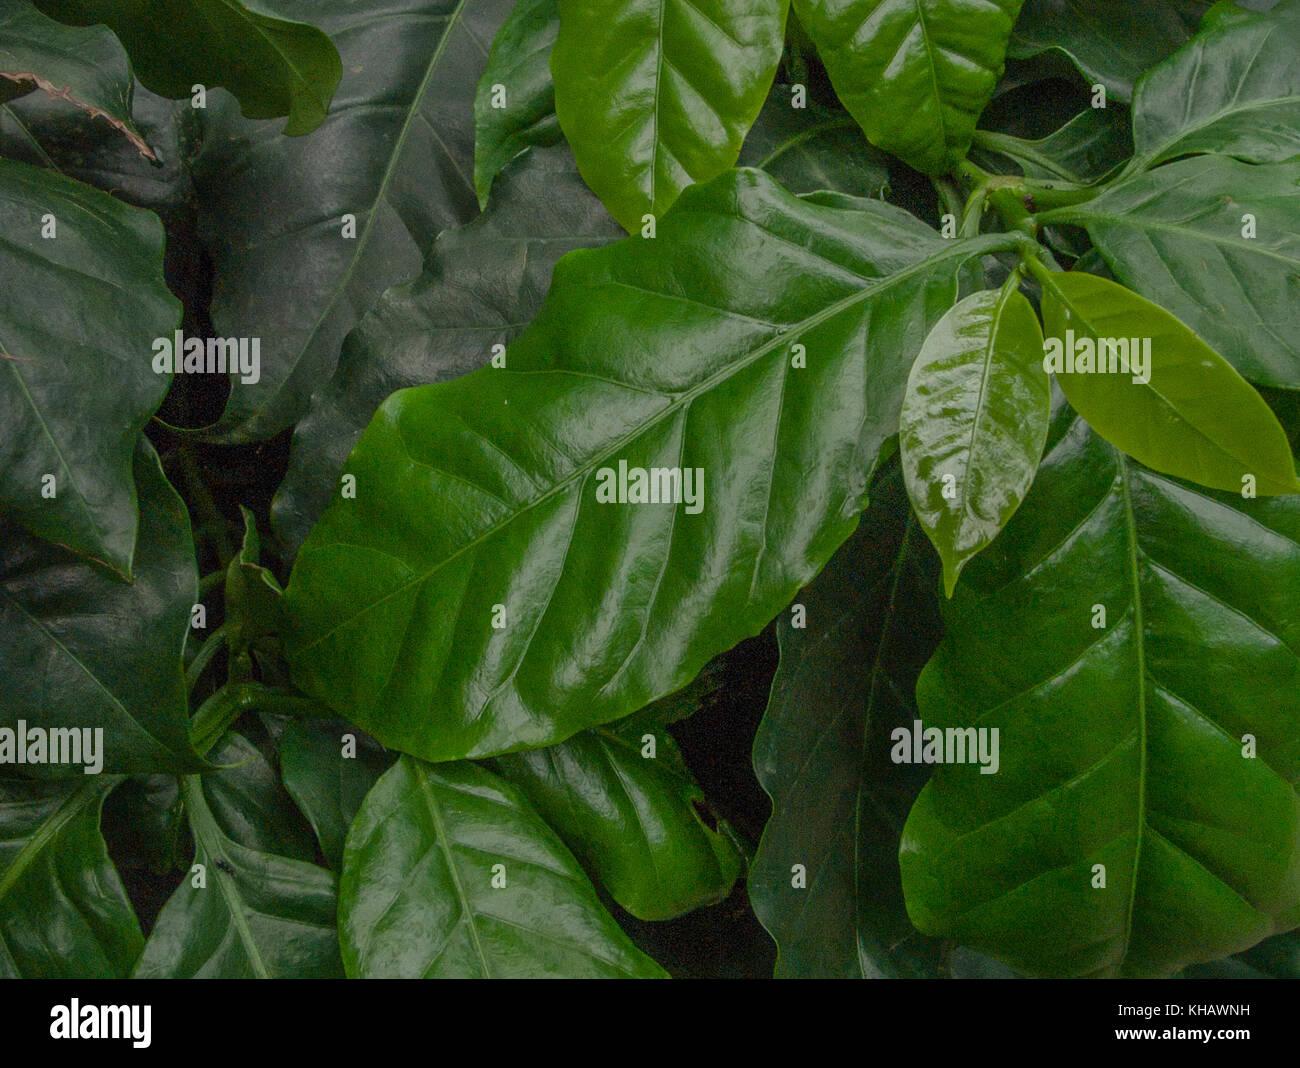 Foliage of the Arabian Coffee plant (Coffea arabica). - Stock Image